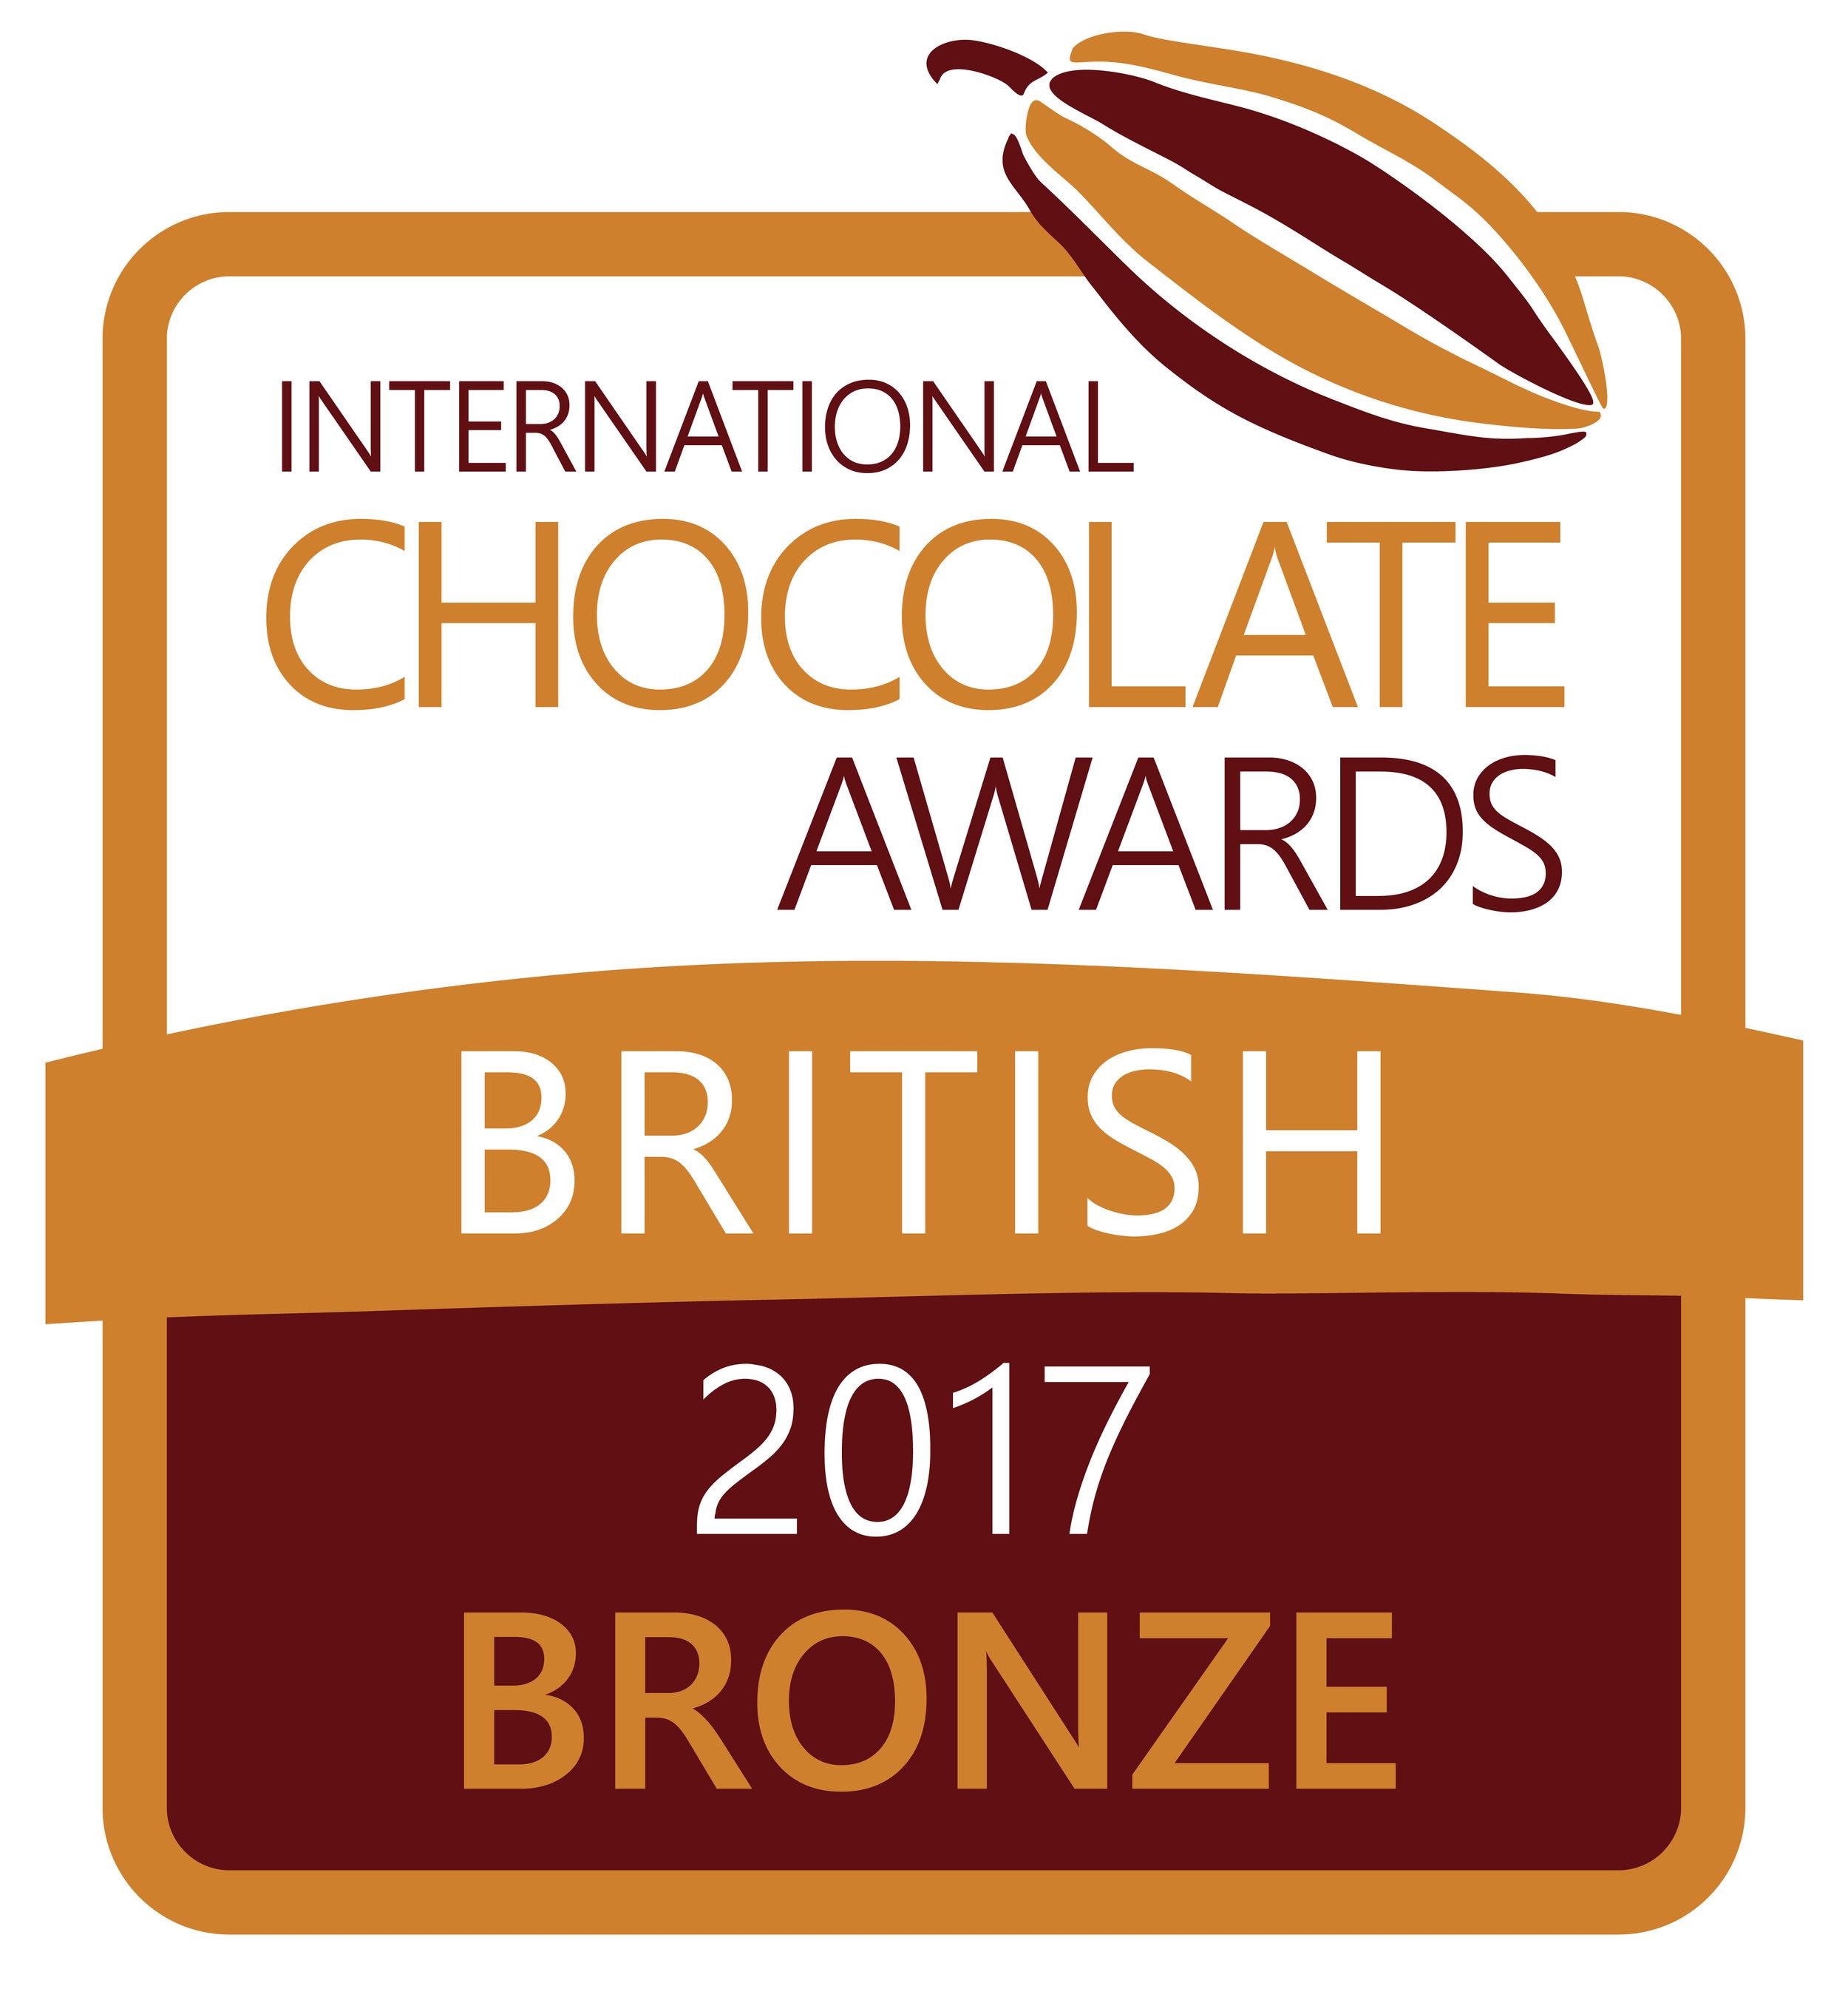 ica-prize-logo-2017-bronze-british-rgb.jpg